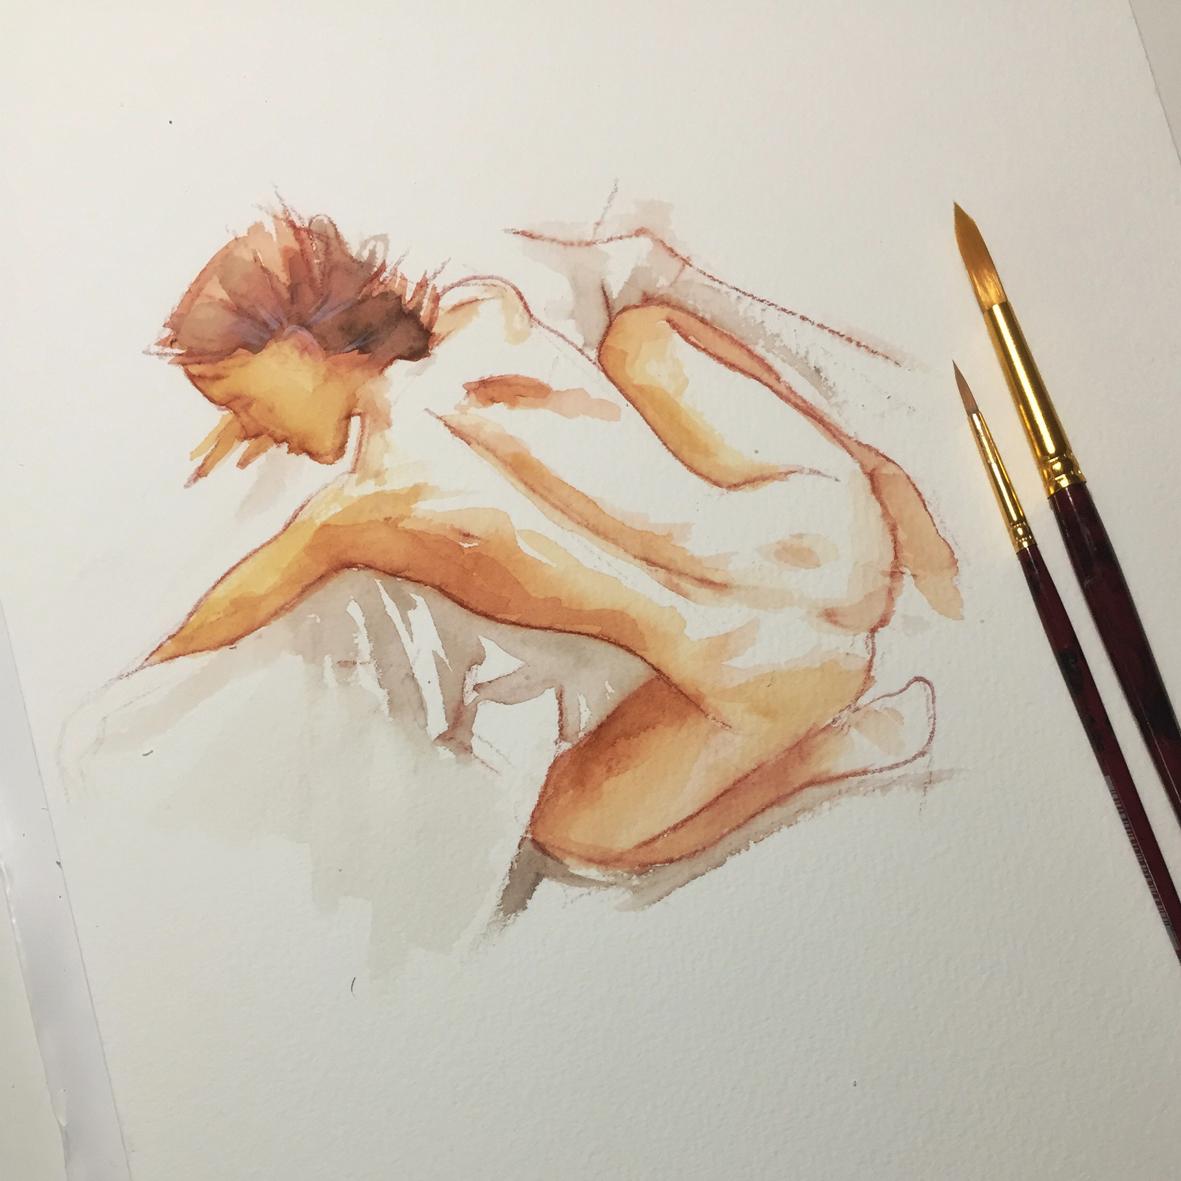 008 Radmila Vito Lentini Designer Acquarelli Sketches